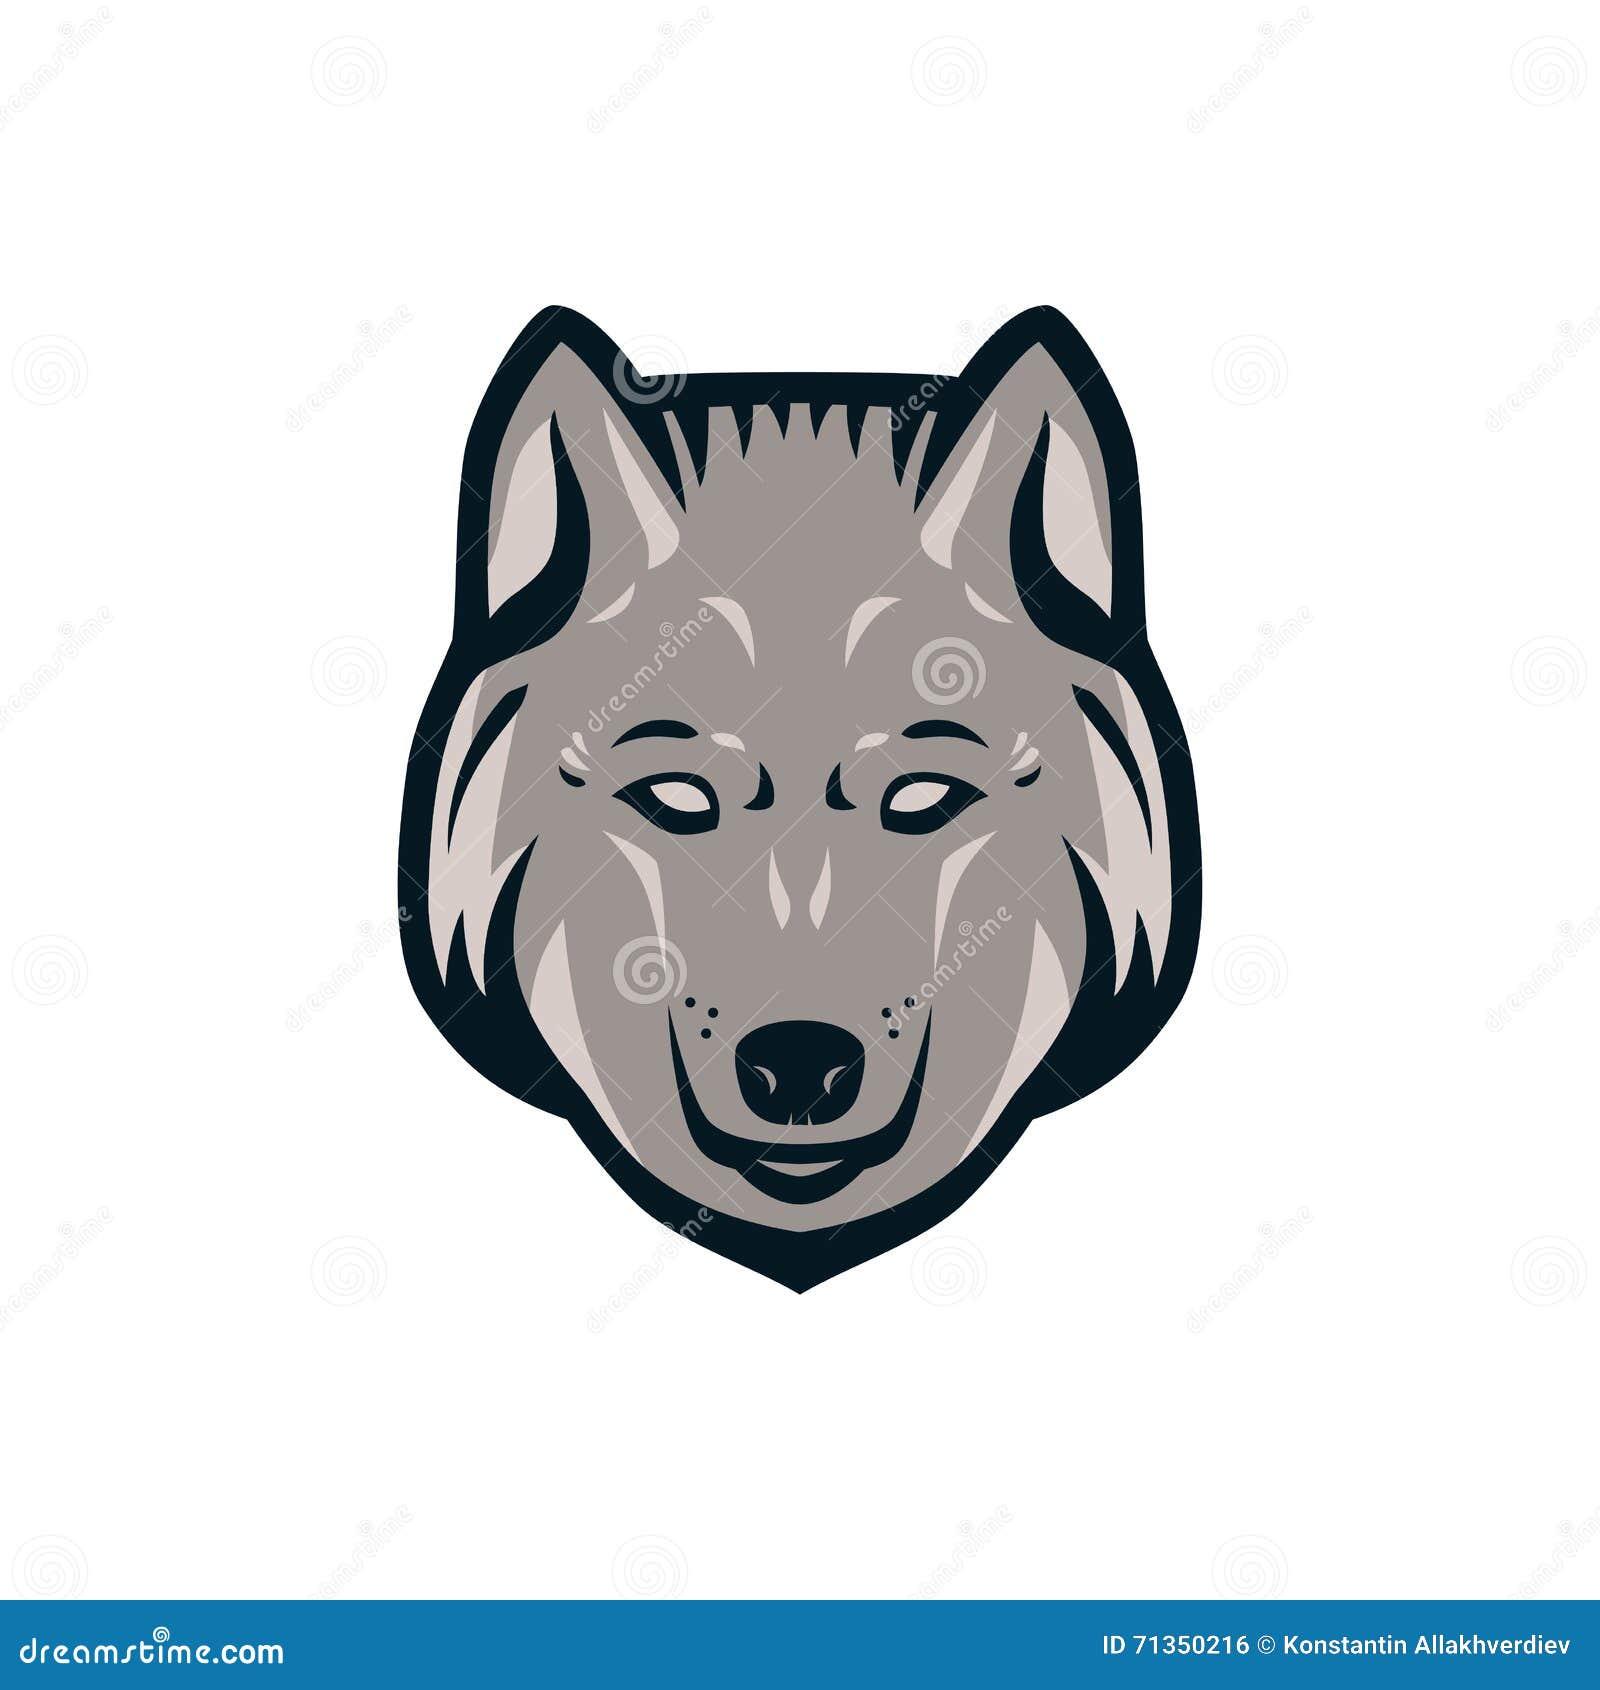 wolf head logo stock vector illustration of husky animal 71350216